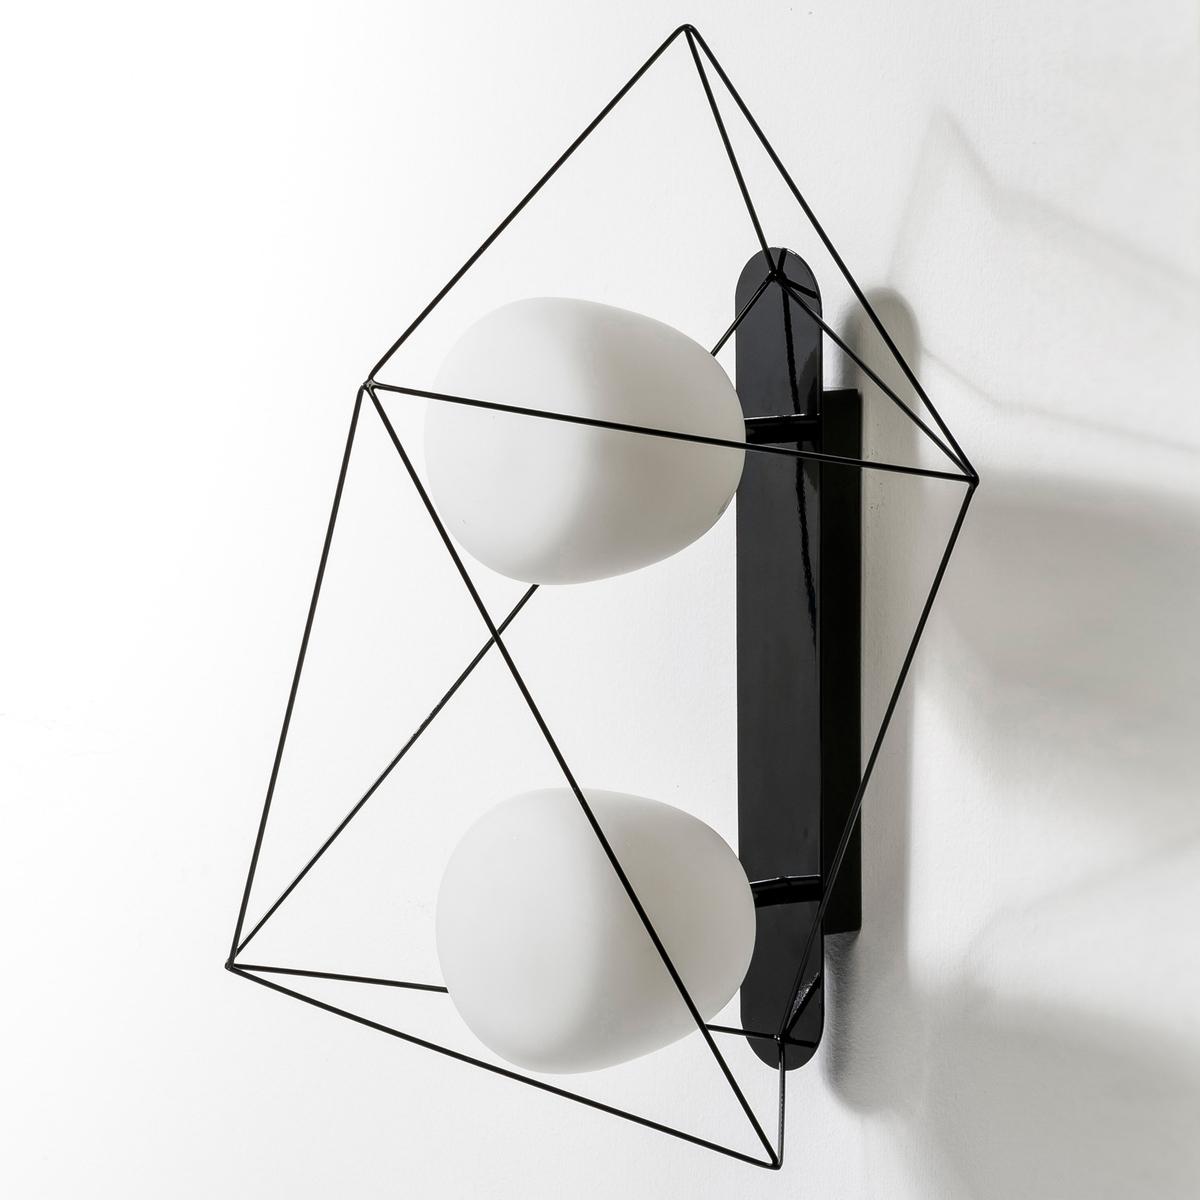 Светильник Spiro, дизайн Э. Галлины от La Redoute